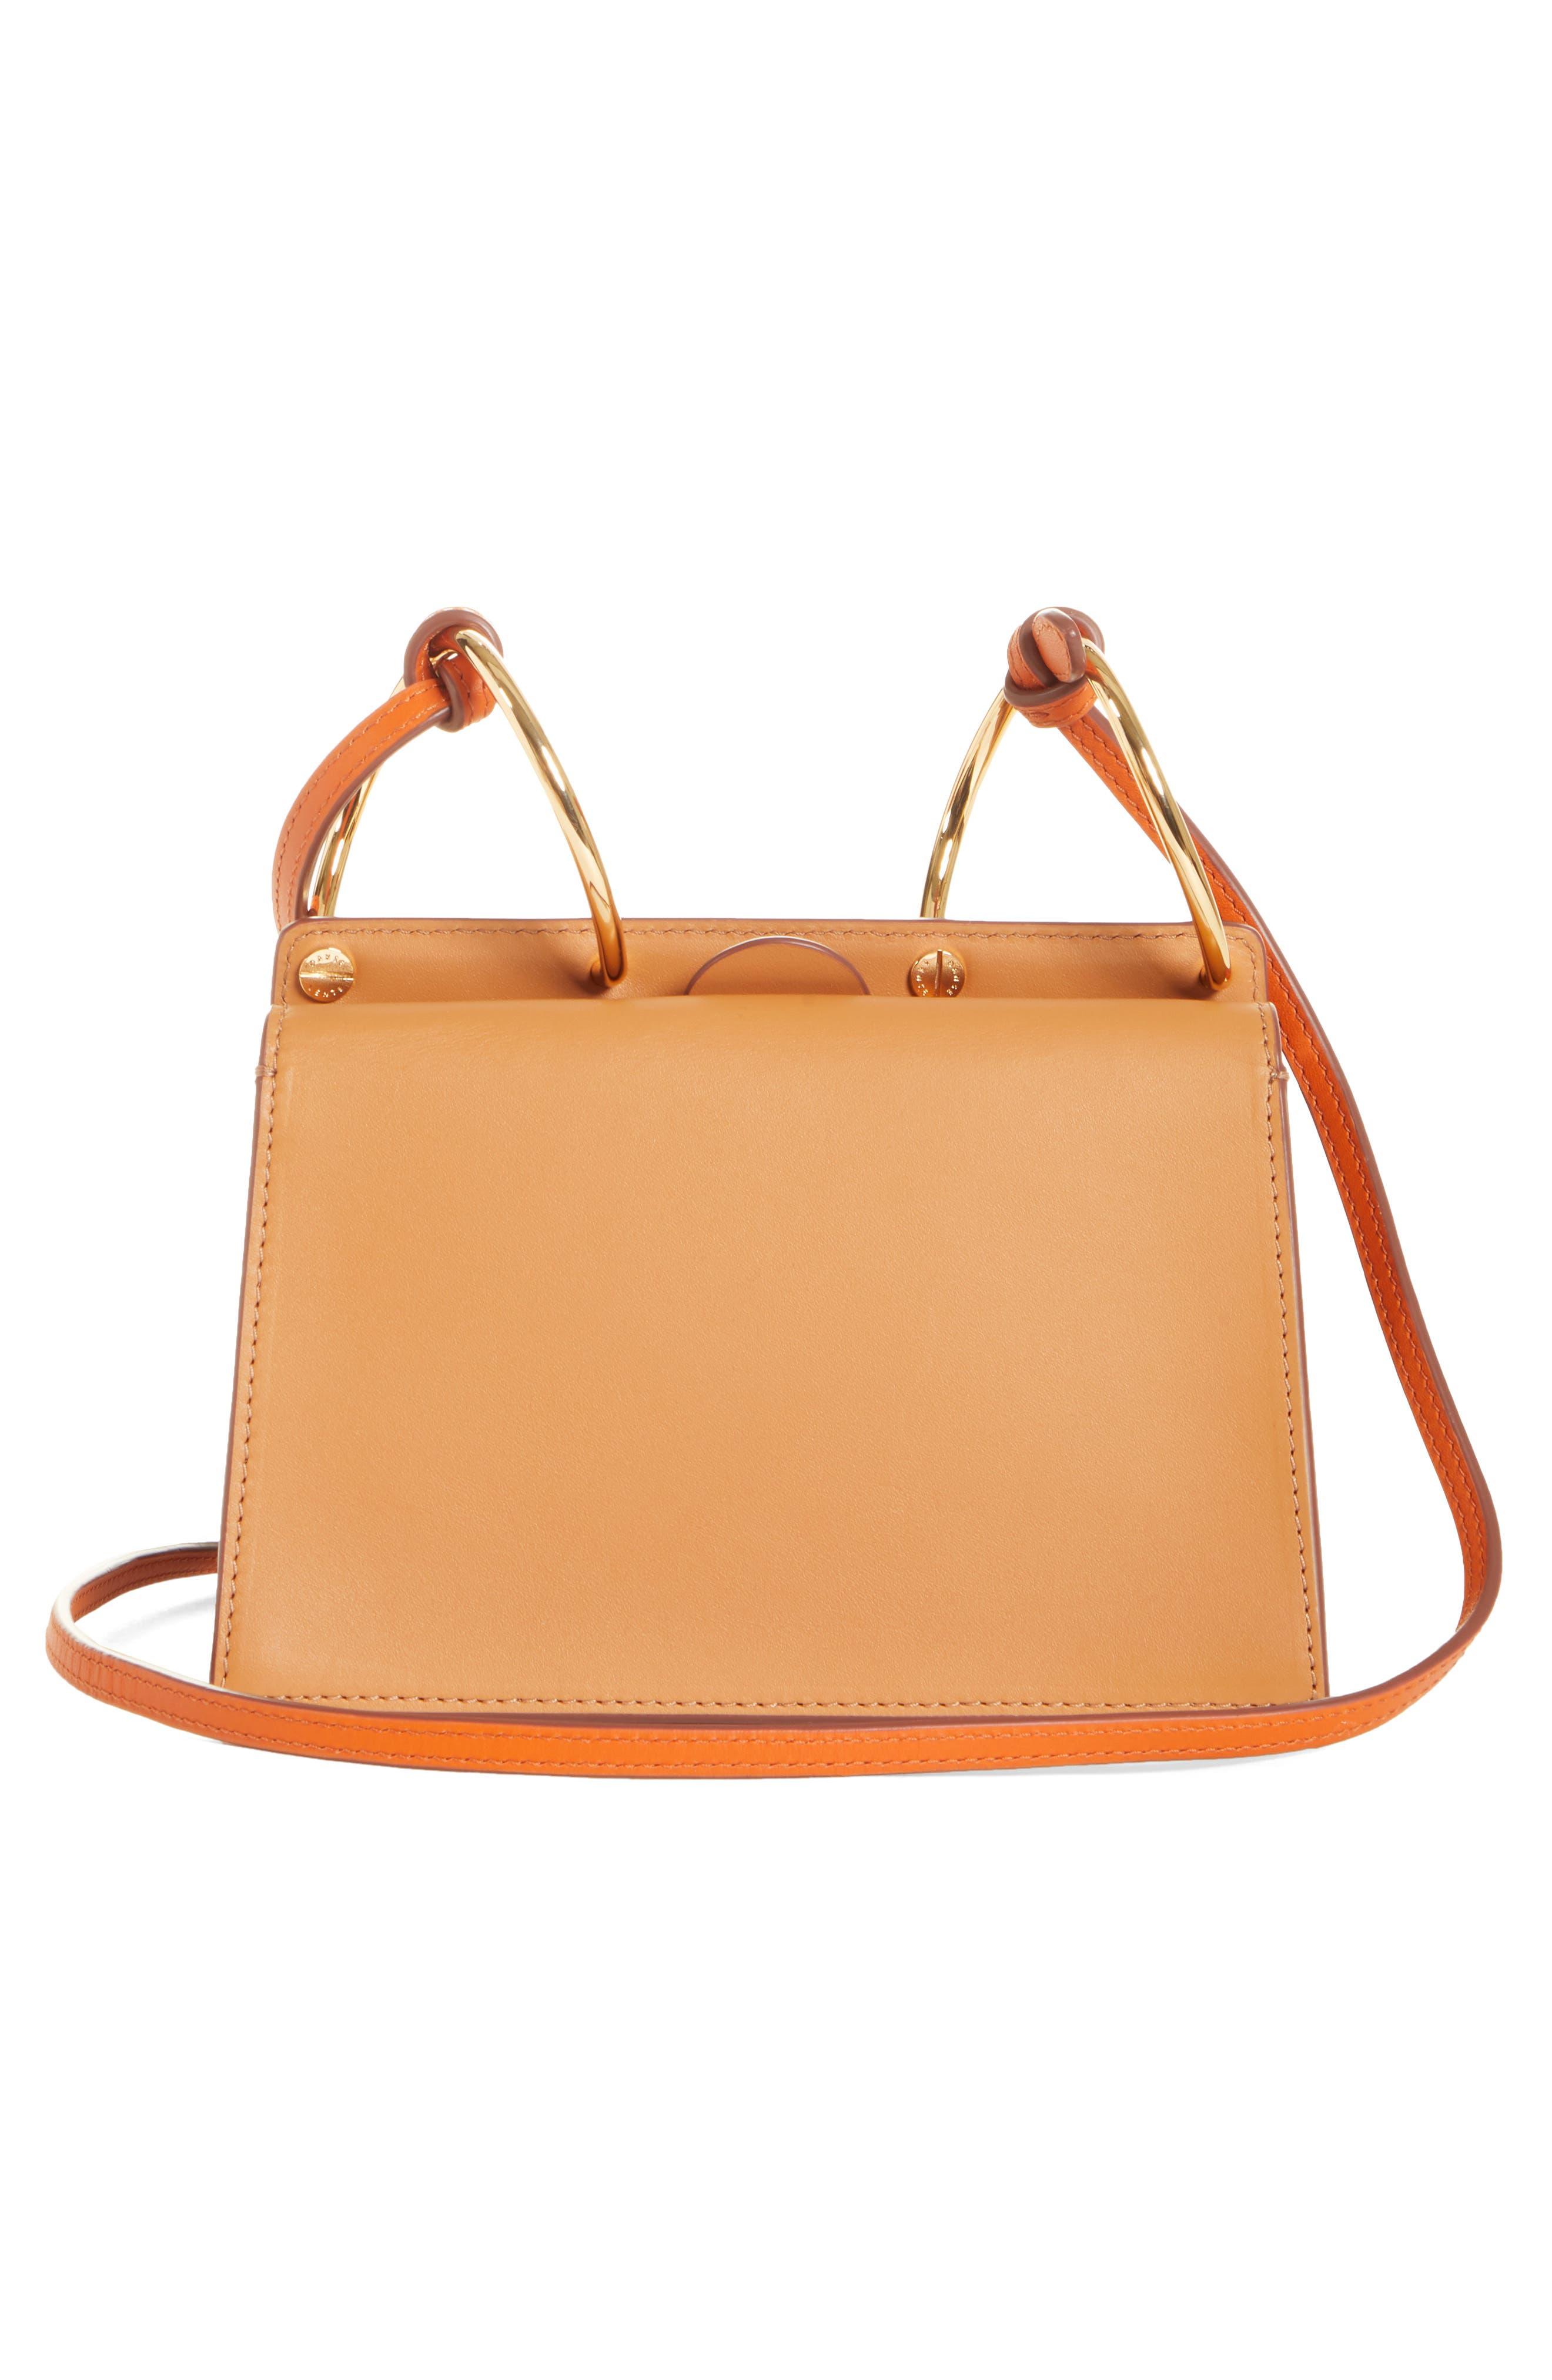 DANSE LENTE,                             Mini Phoebe Leather Bag,                             Alternate thumbnail 3, color,                             TOFFEE/ MARSHMALLOW